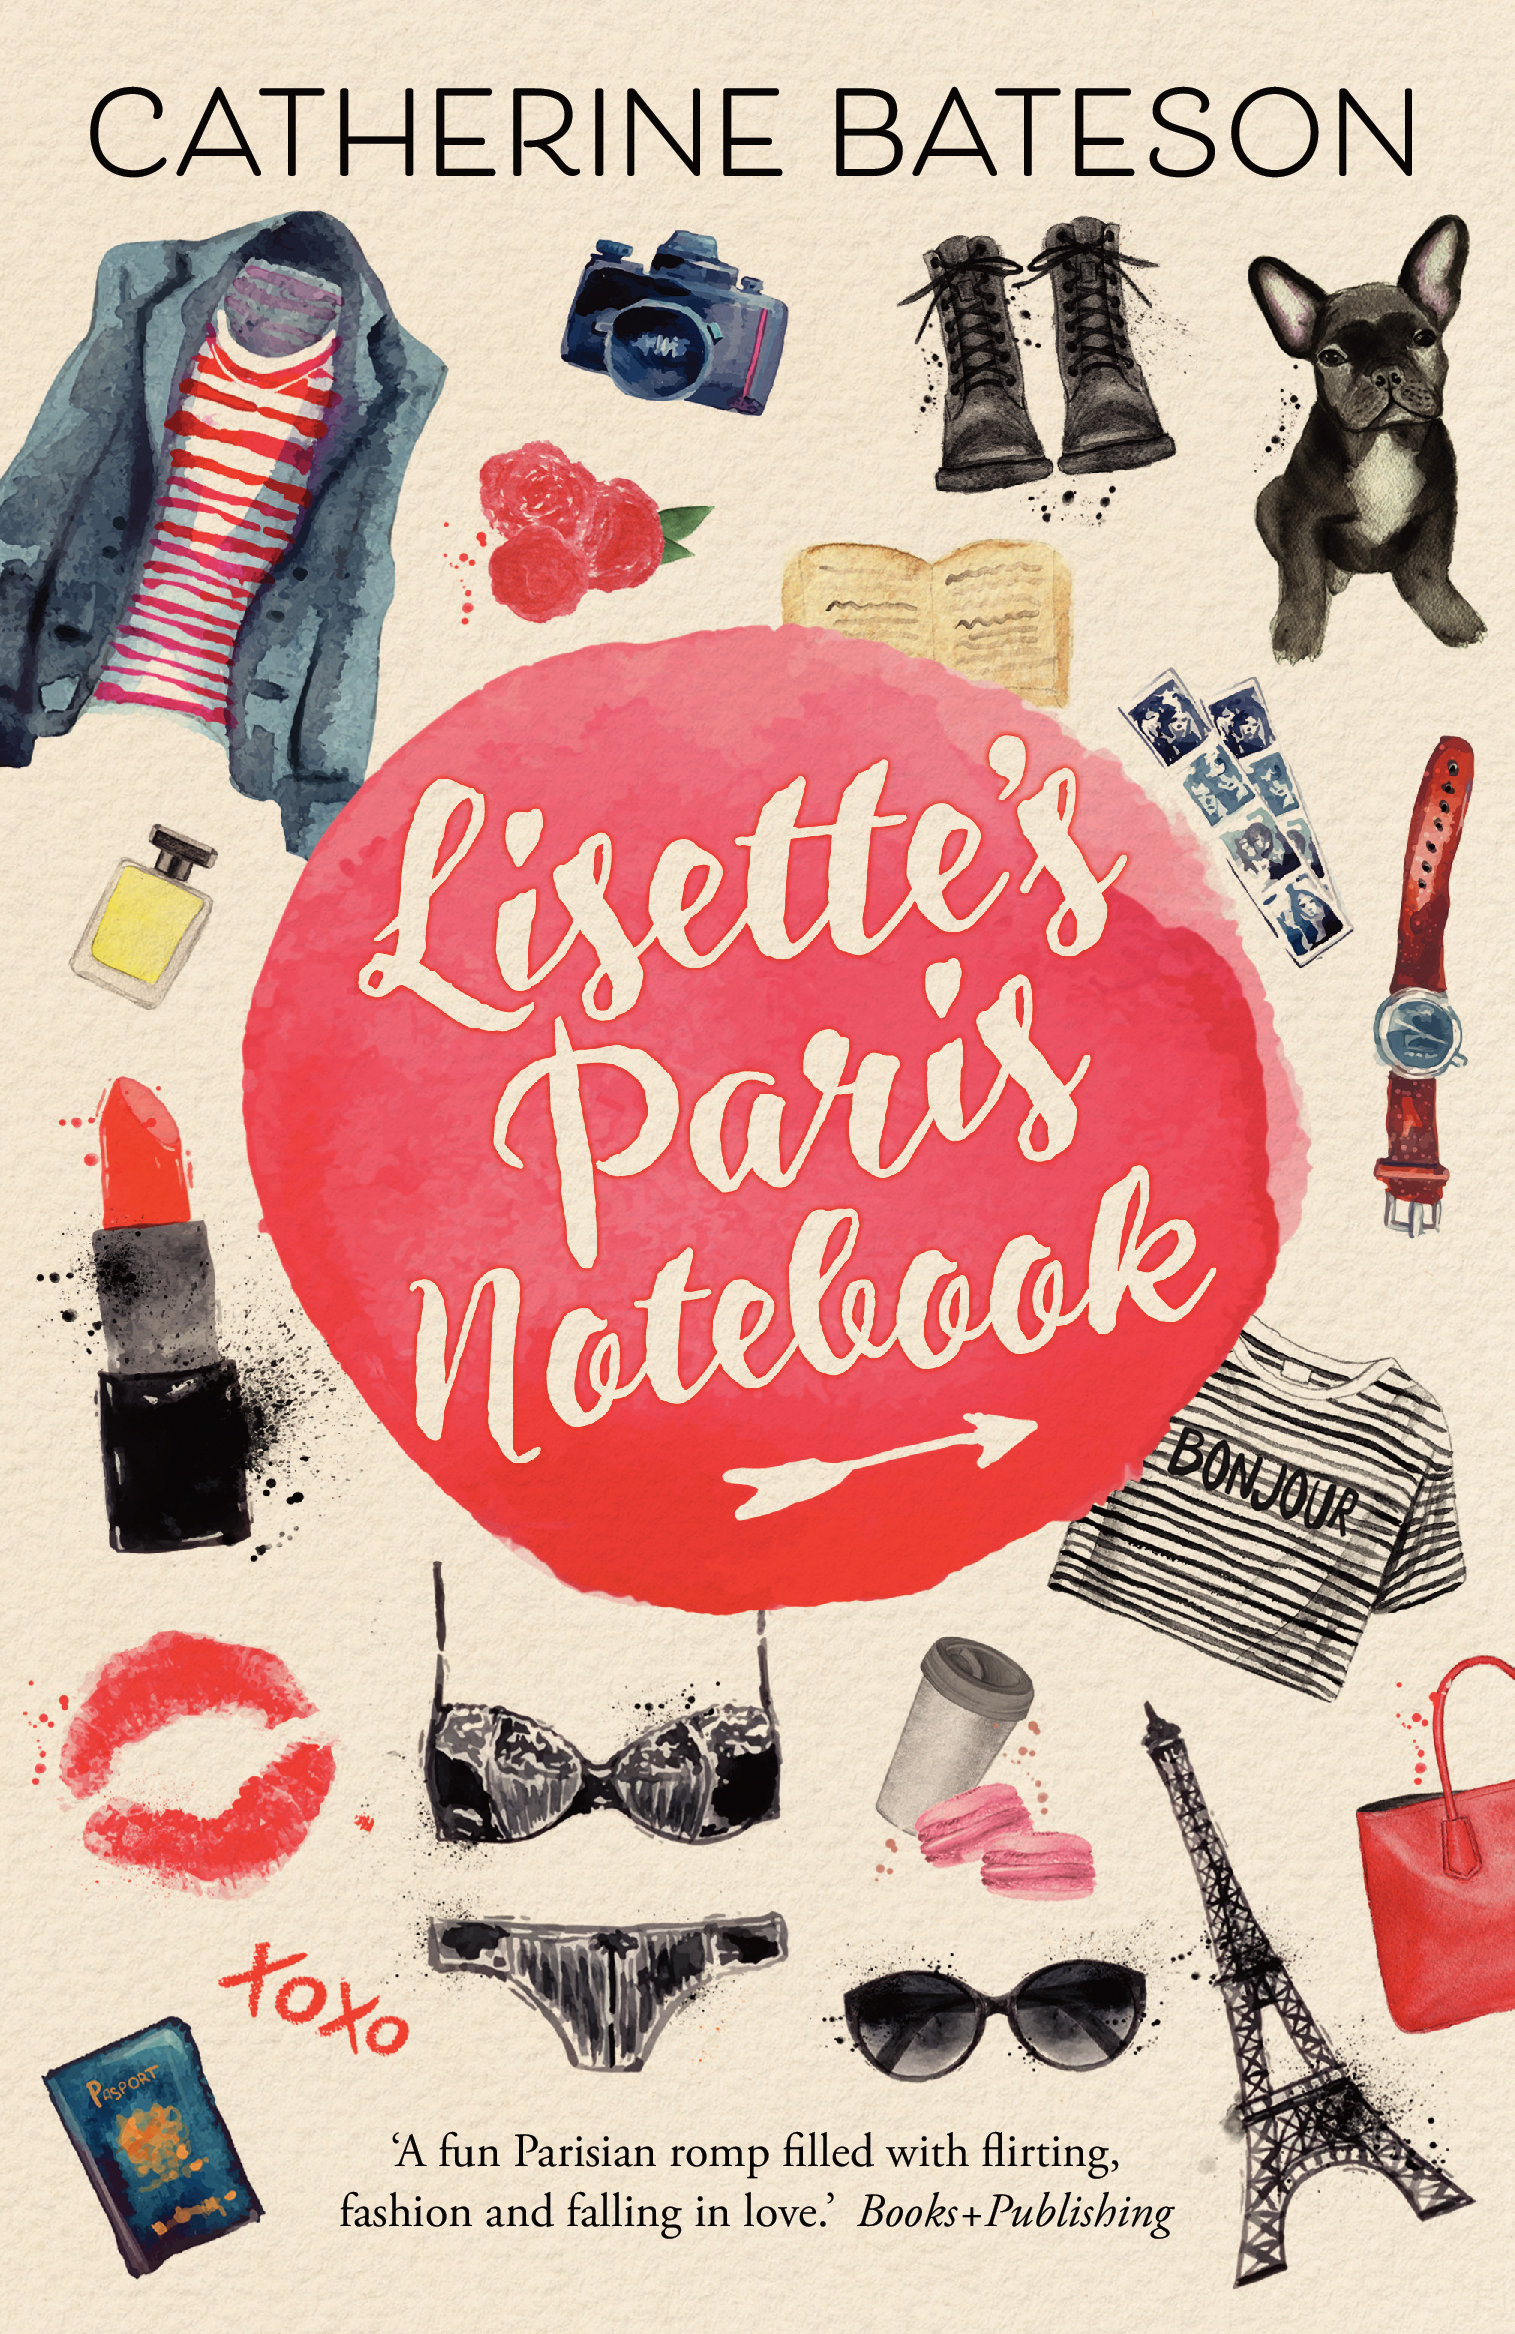 Lisette's Paris Notebookby Catherine Bateson